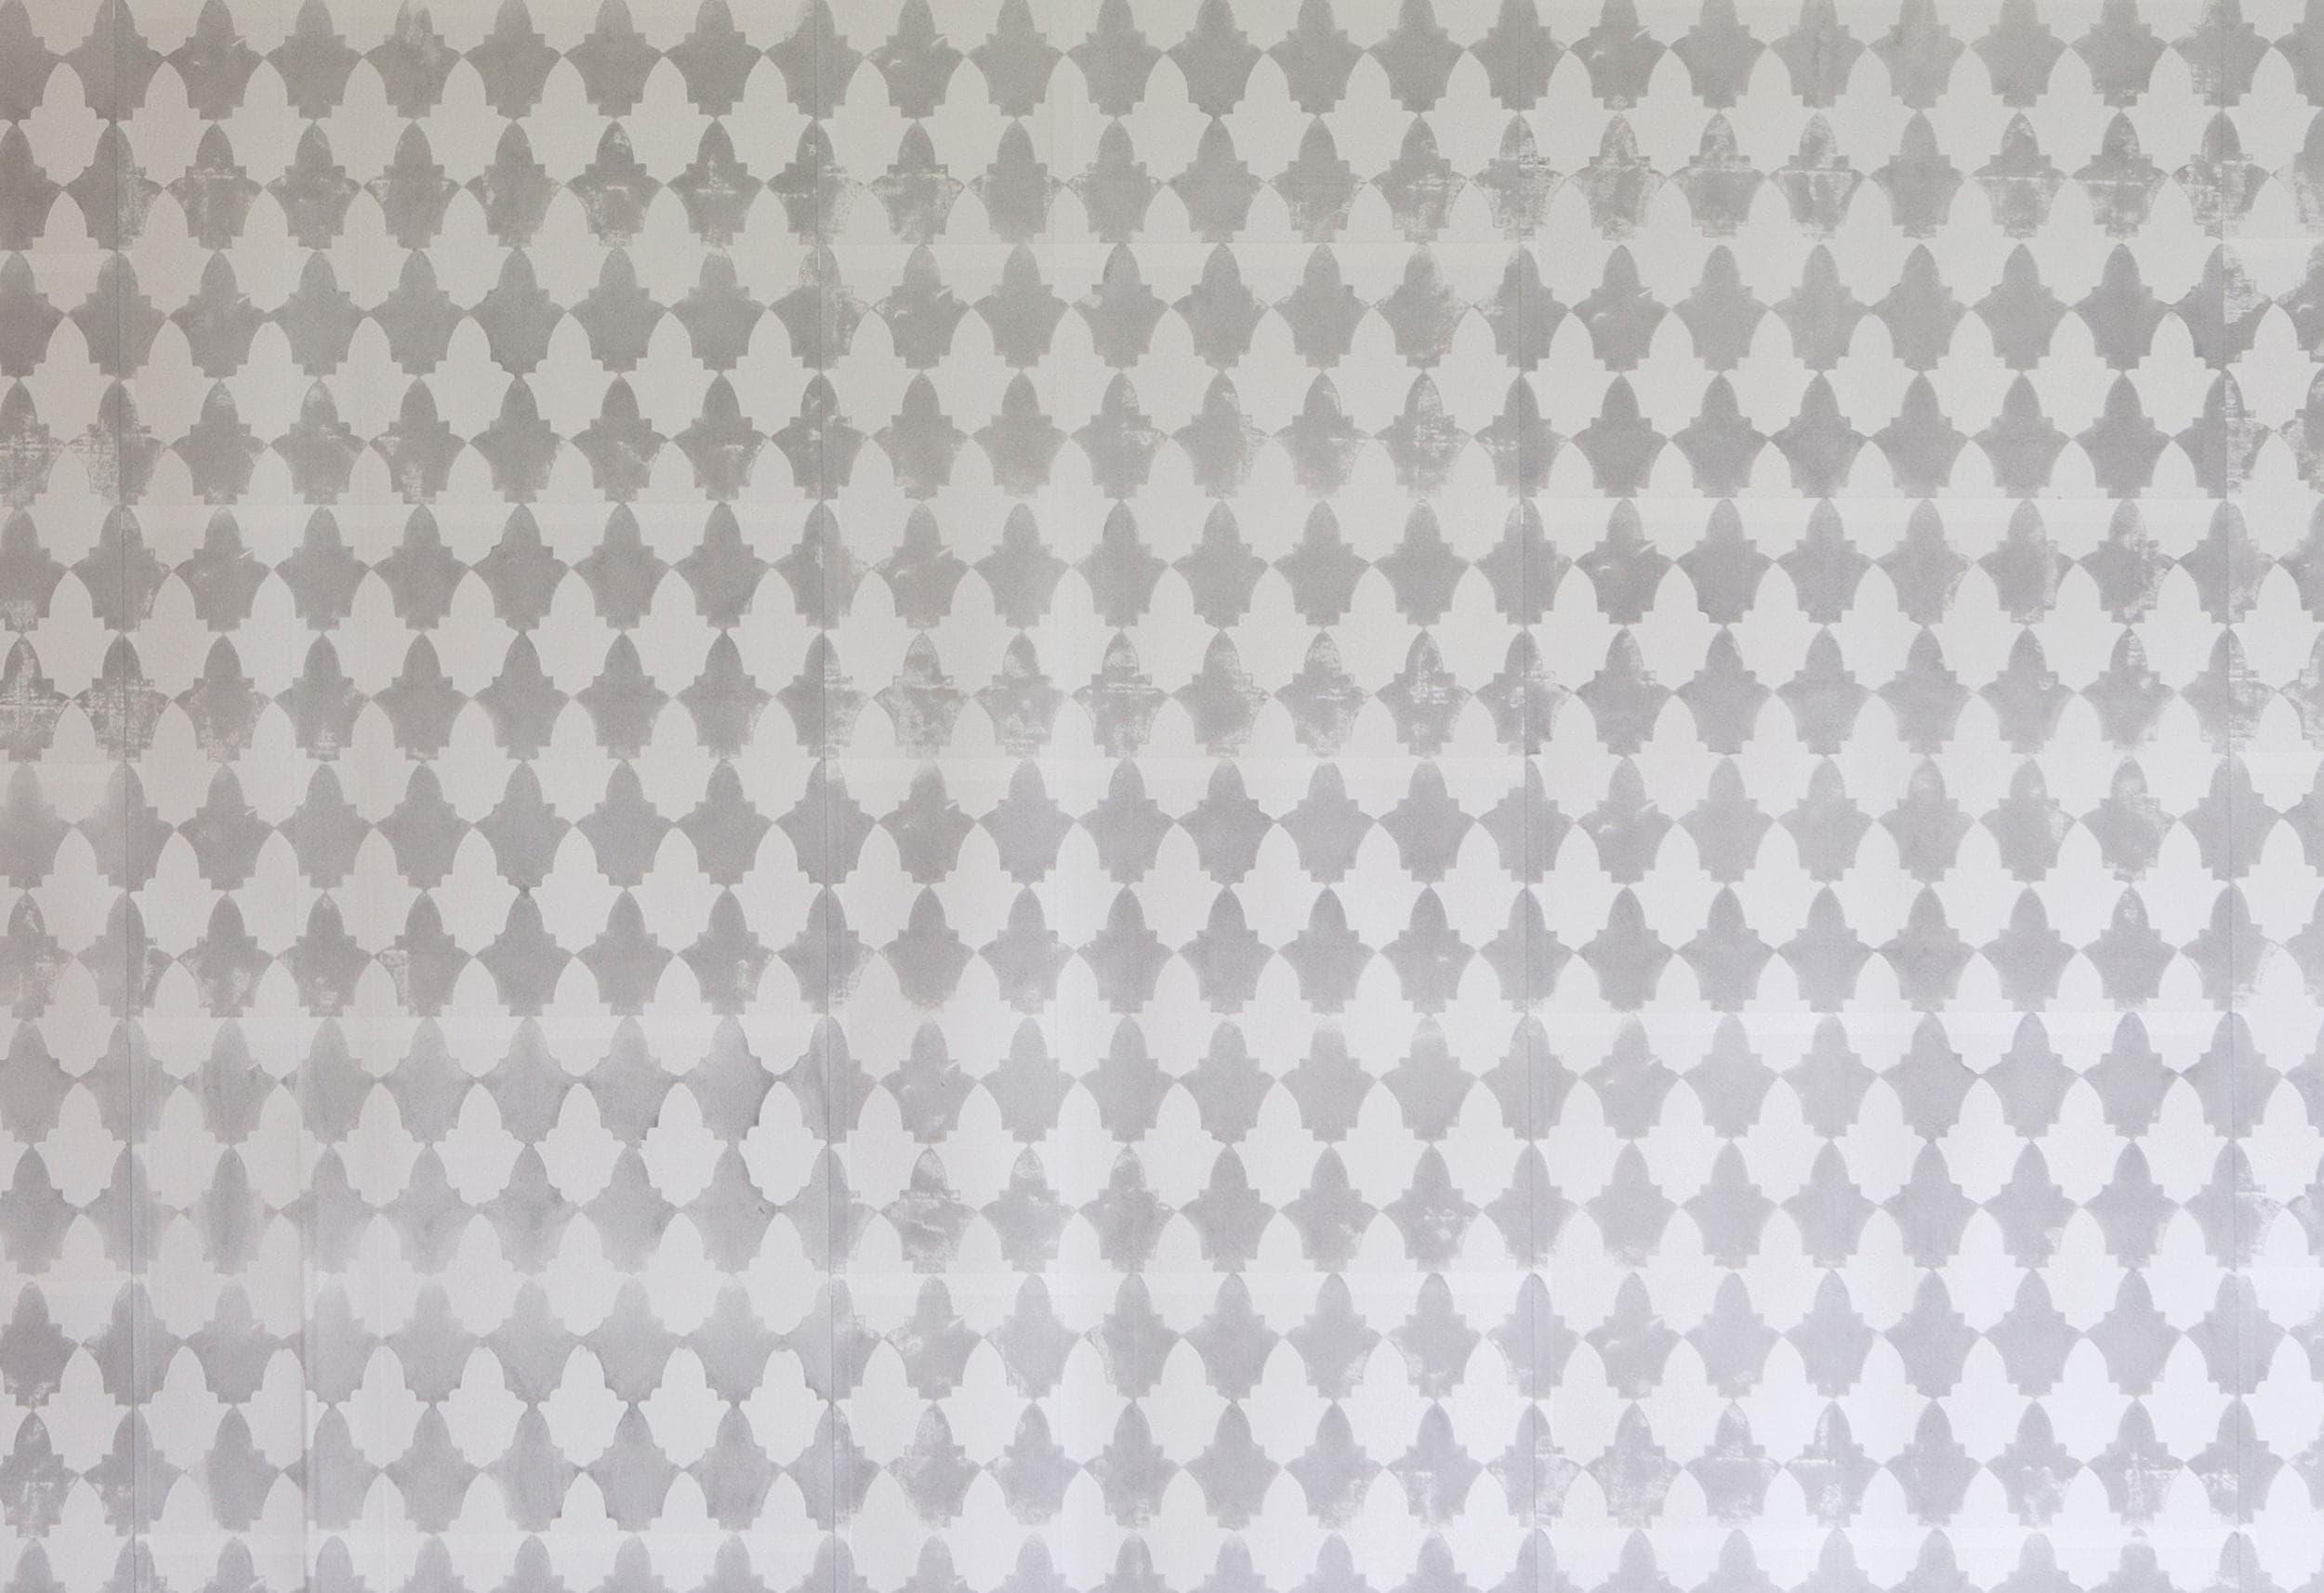 Tessellation. 1800